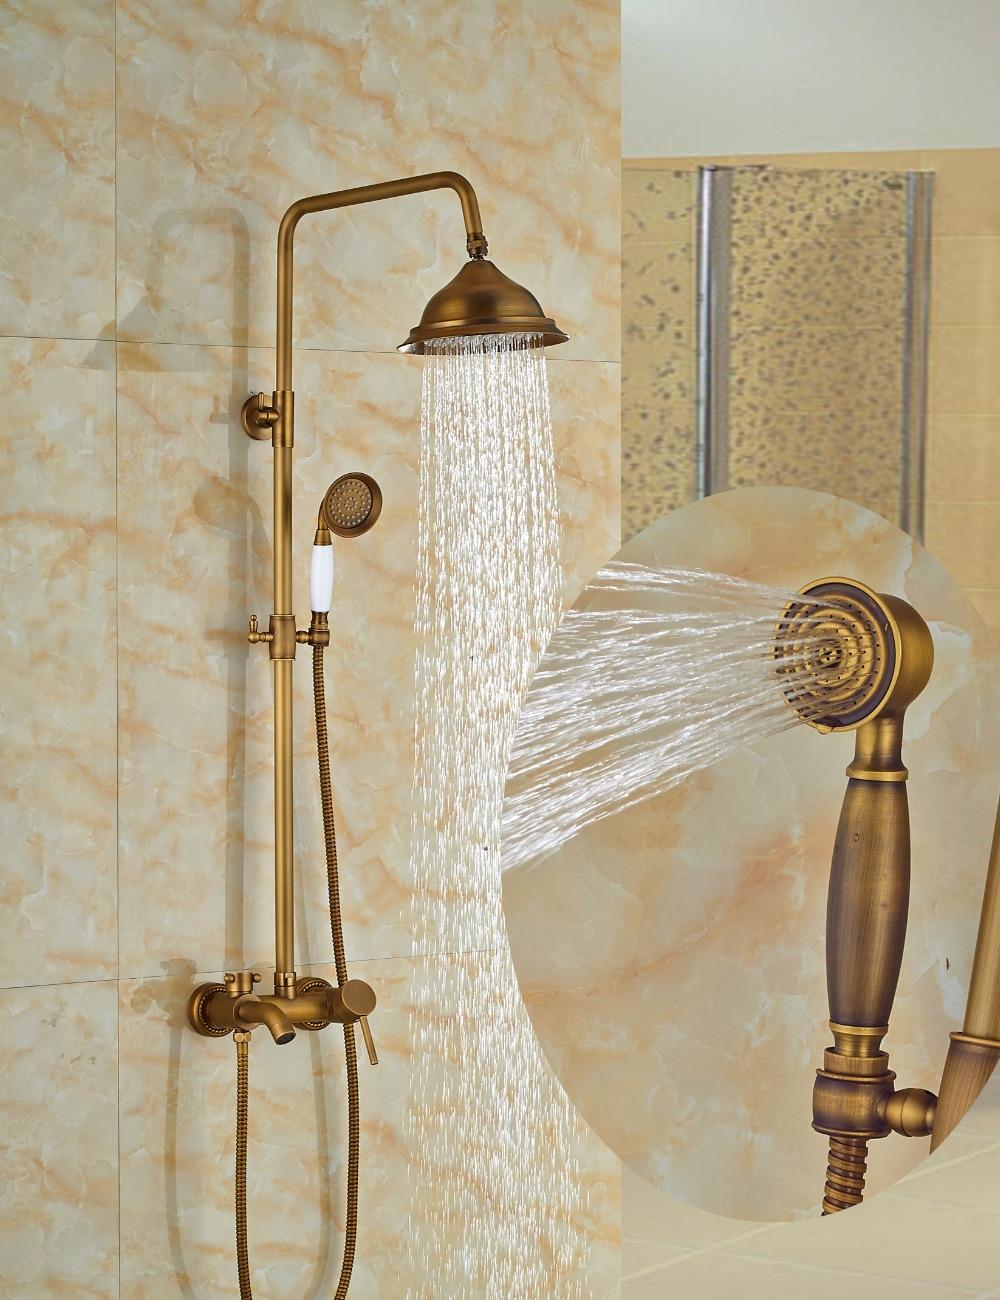 Wholesale And Retail Modern Antique Brass Rain Shower Head Faucet Valve Mixer Tap W/ Hand Shower Sprayer Shower Column